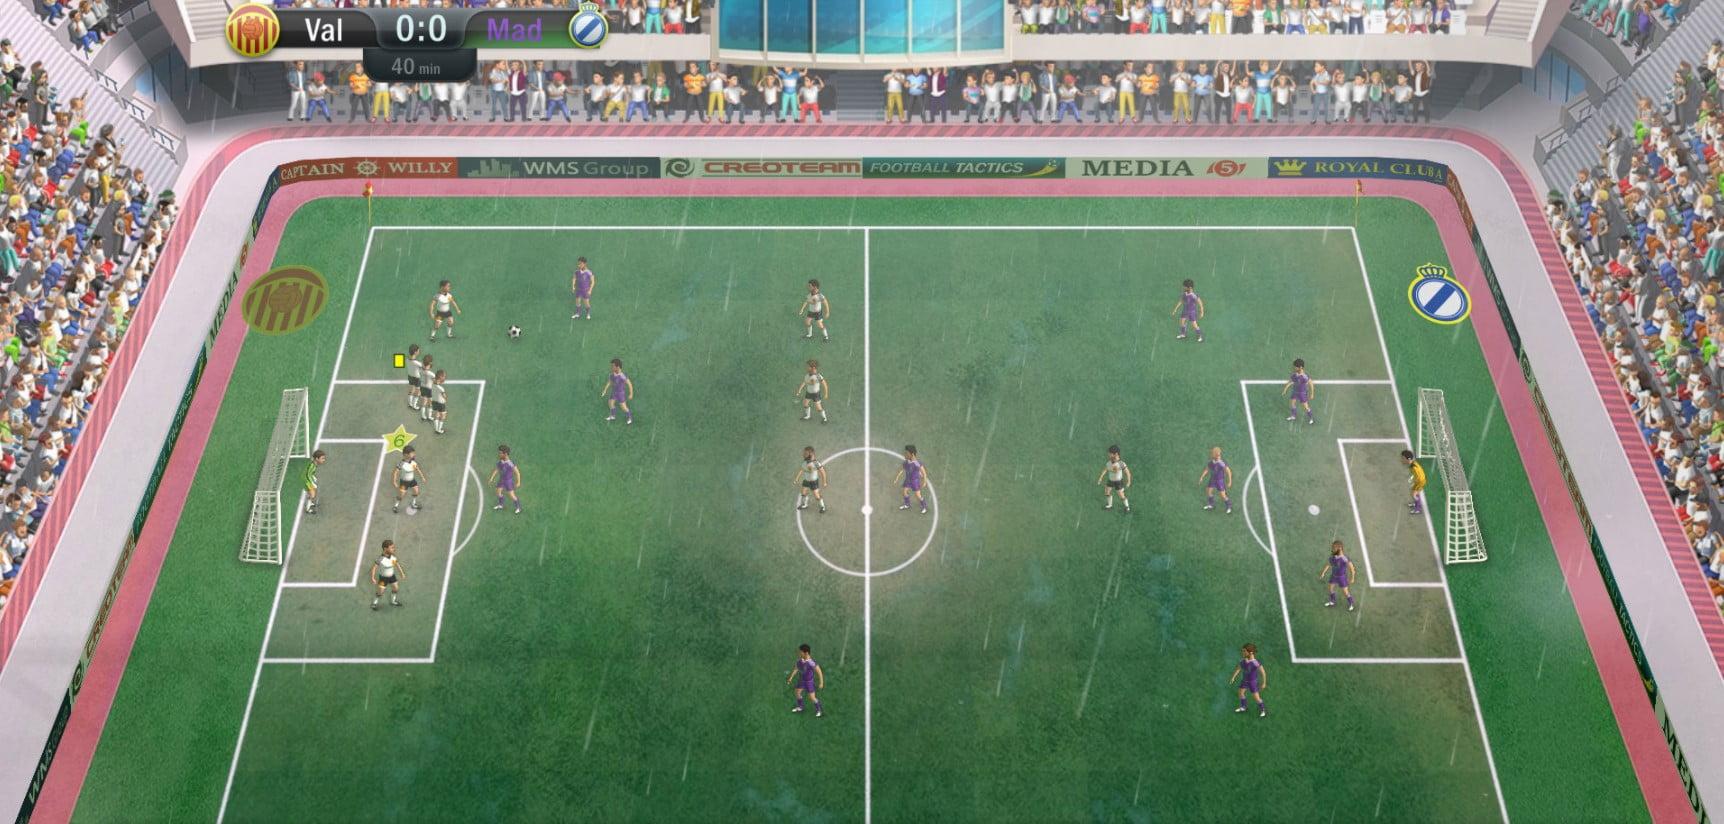 Football Tactics Nepomirno Rozroslas Zavdyaki Novomu Onovlennyu Playua